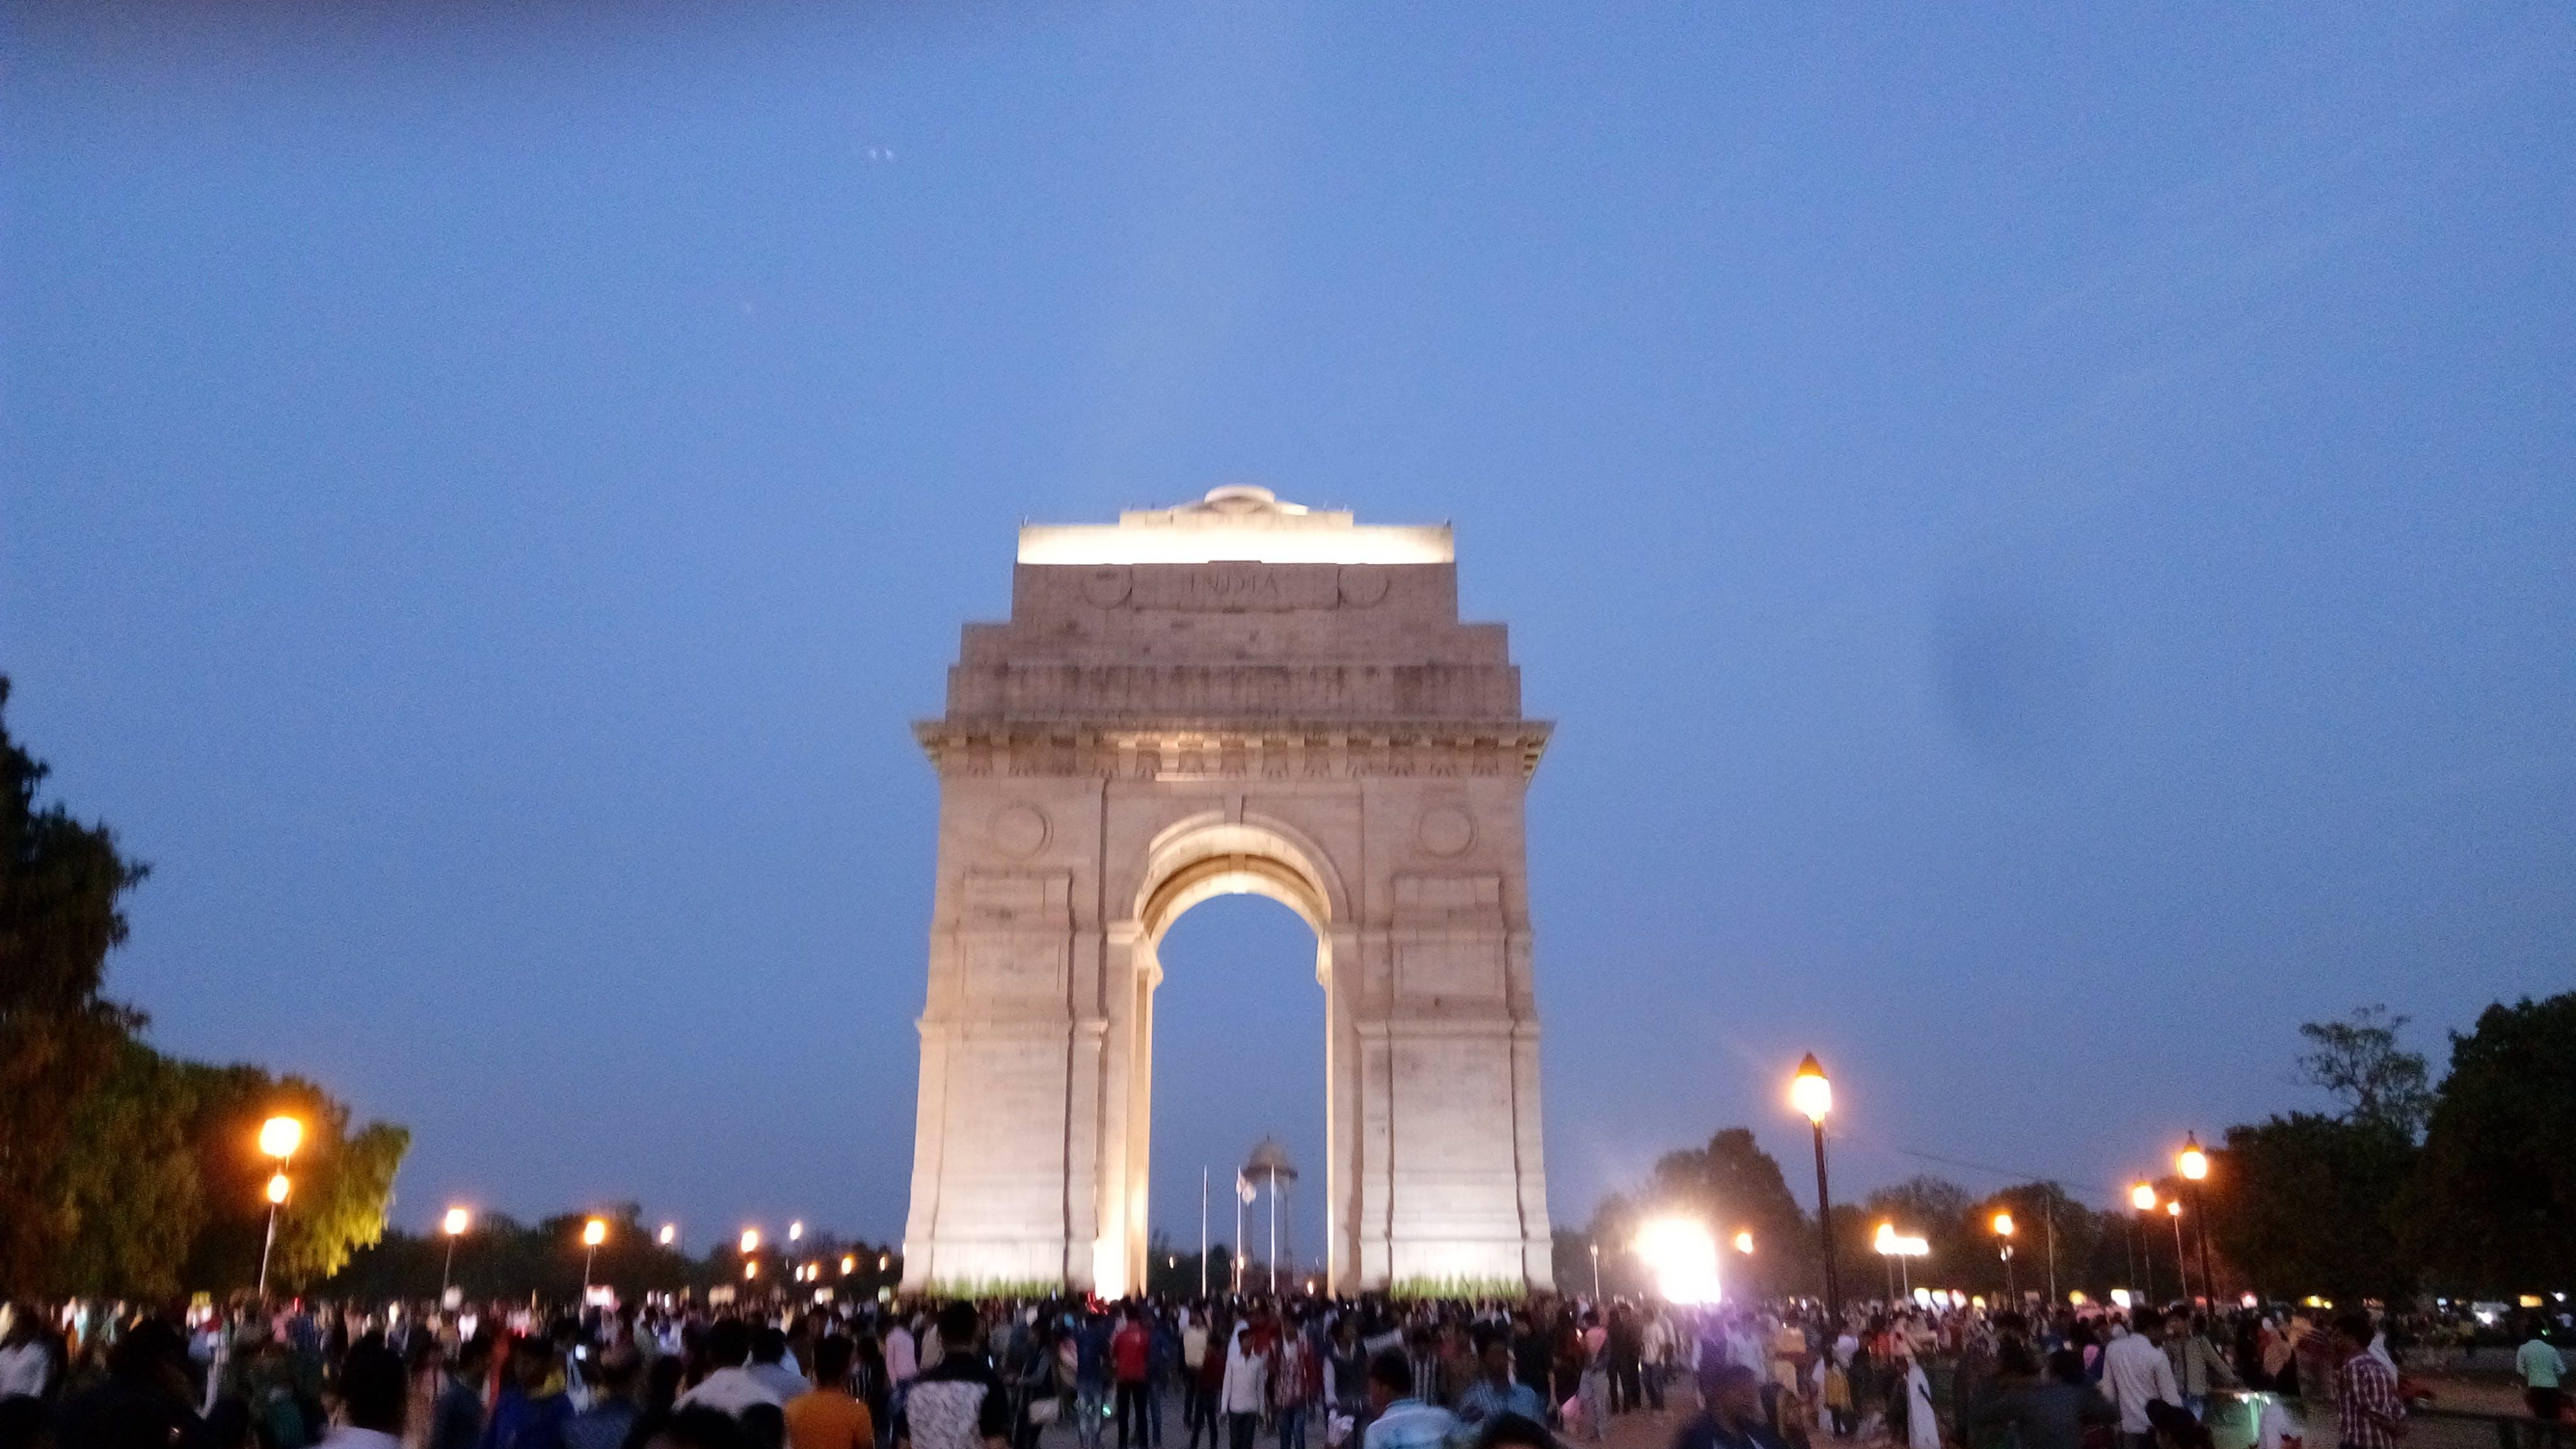 Free stock photo of India Gate